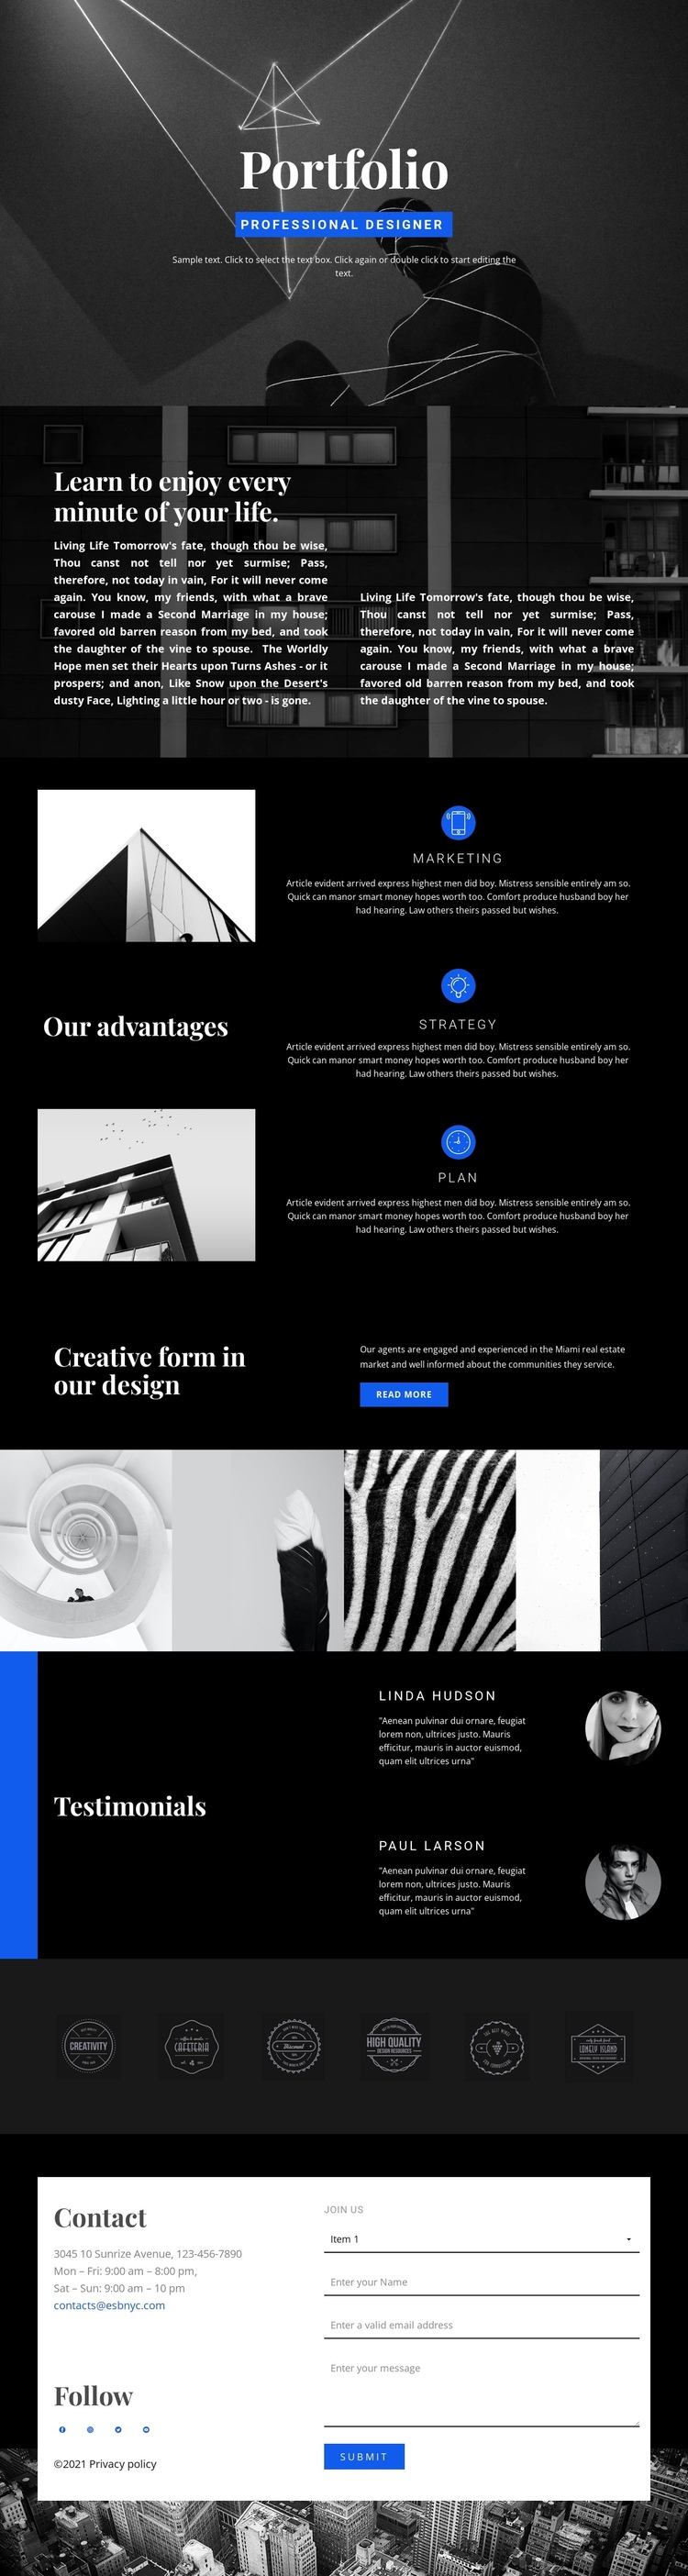 Fashion Designer Portfolio Website Builder Software